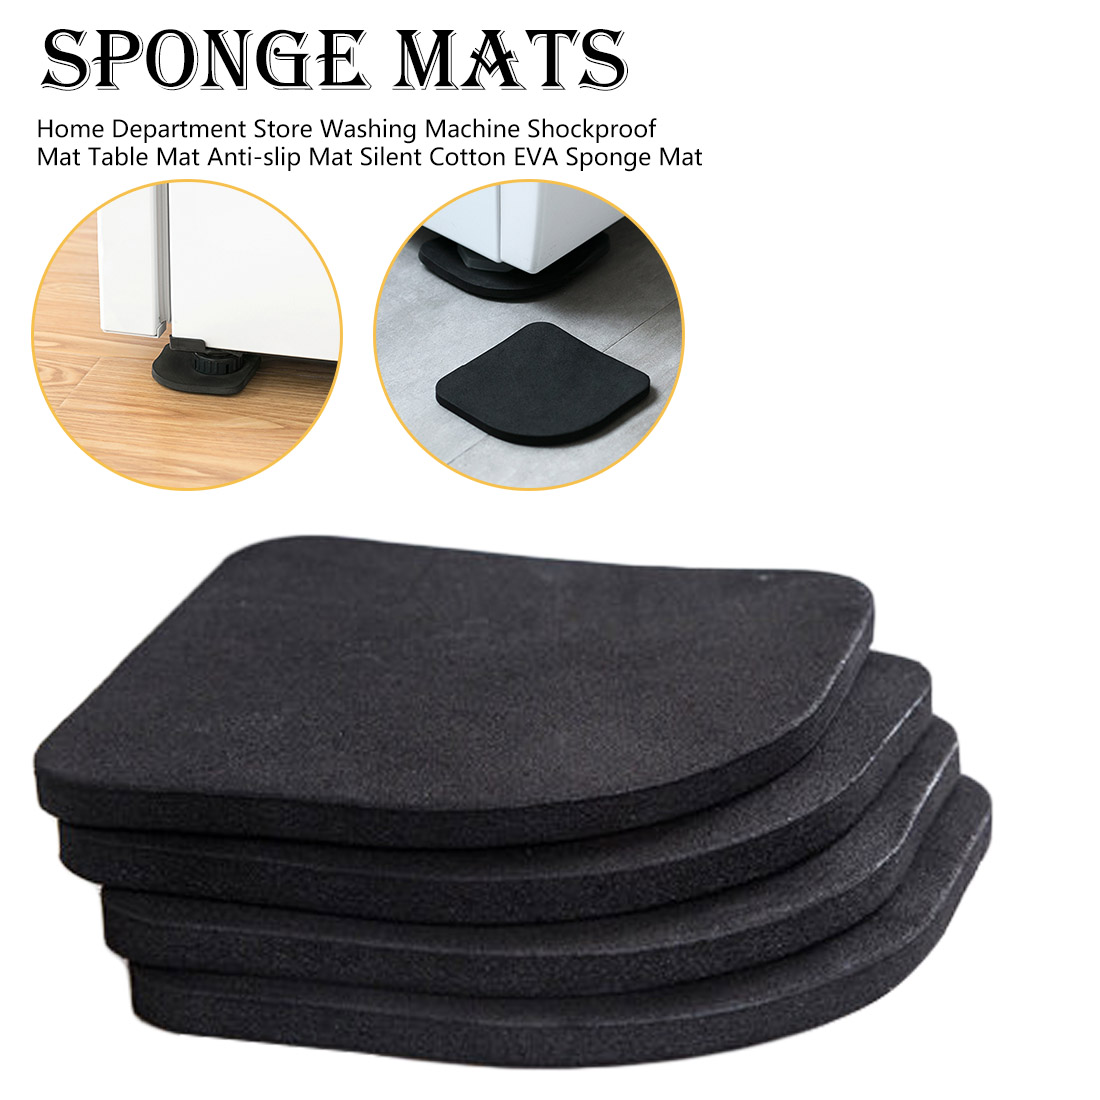 4pcs Home Department Store Anti-slip Mat Silent Cotton Sponge Mat Washing Machine Shockproof Mat Table Mat